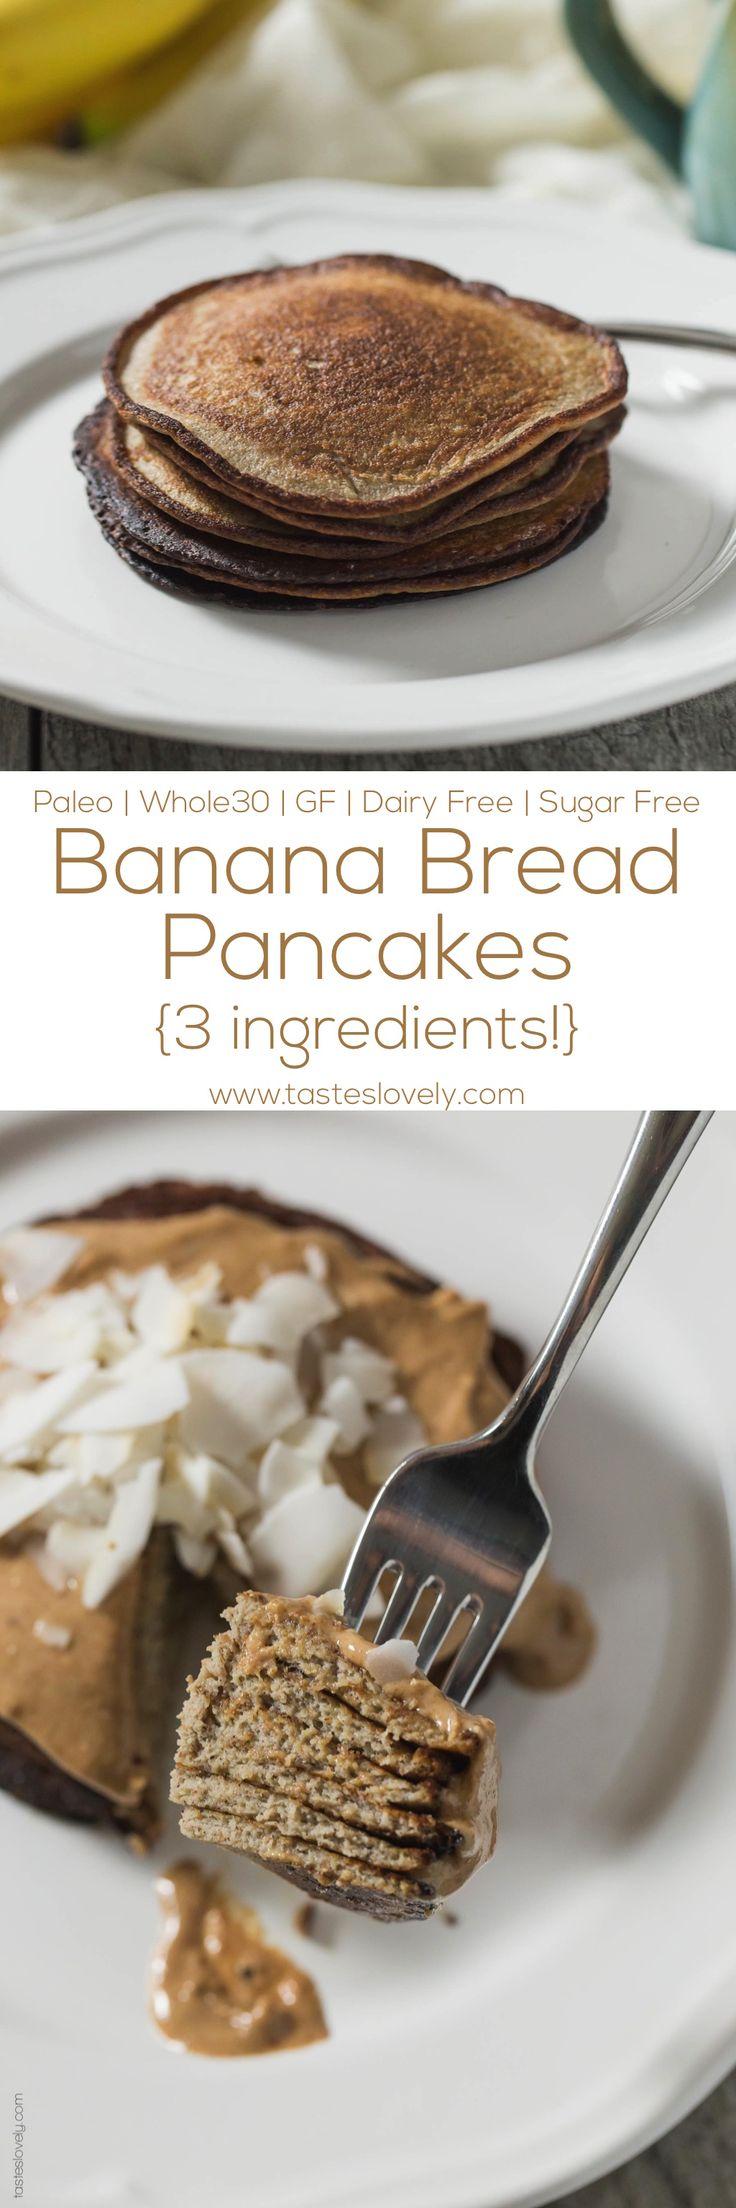 Paleo + Whole30 Banana Bread Pancakes - just 3 ingredients! No flour, no sugar, no butter. Paleo, Whole30, gluten free, grain free, dairy free